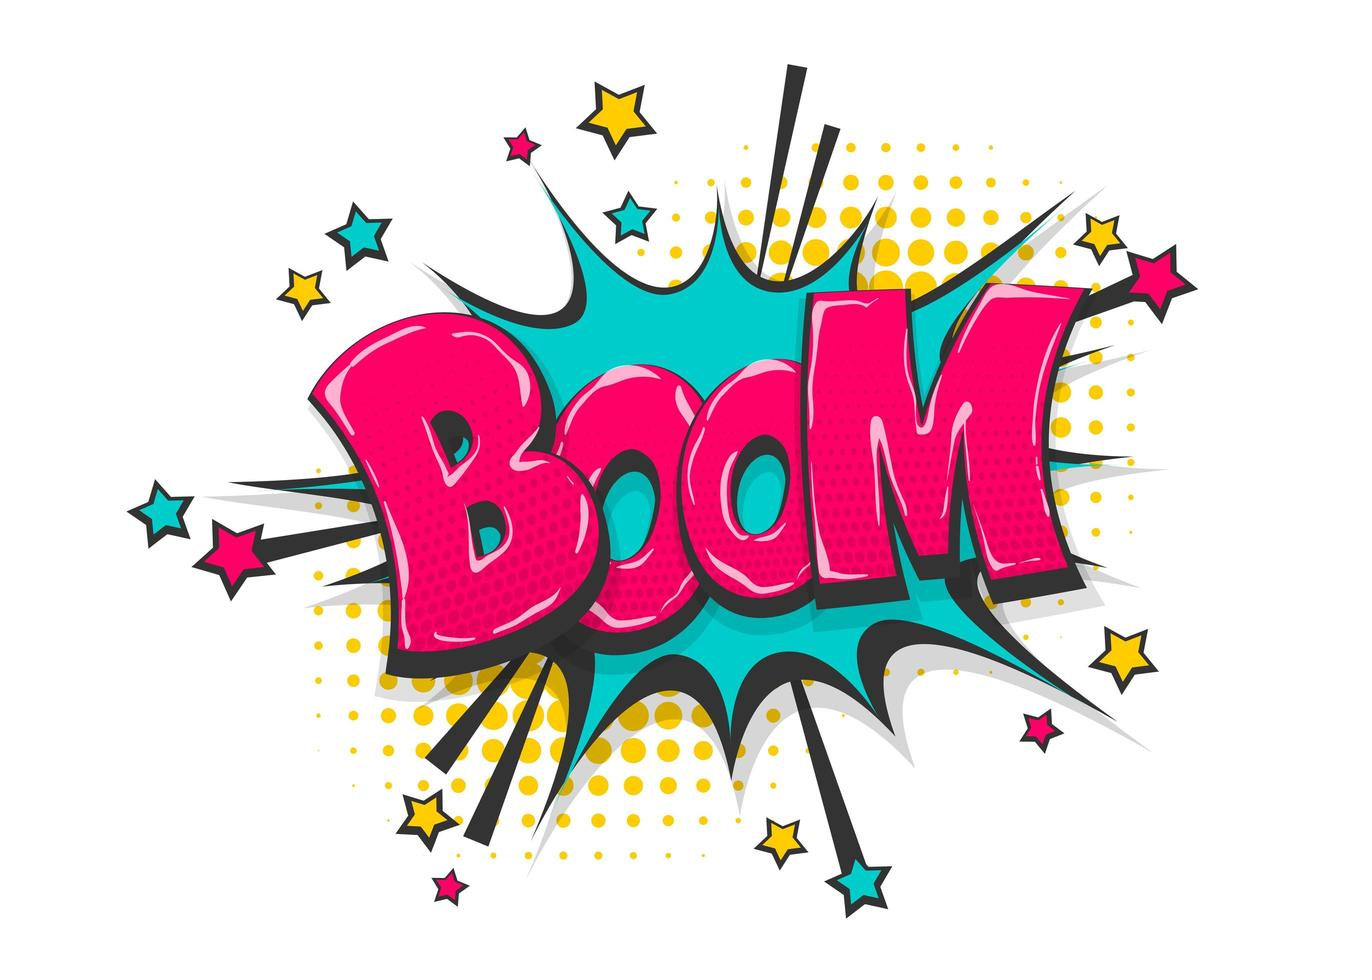 Boom Pop Art Comic Text Design vektor